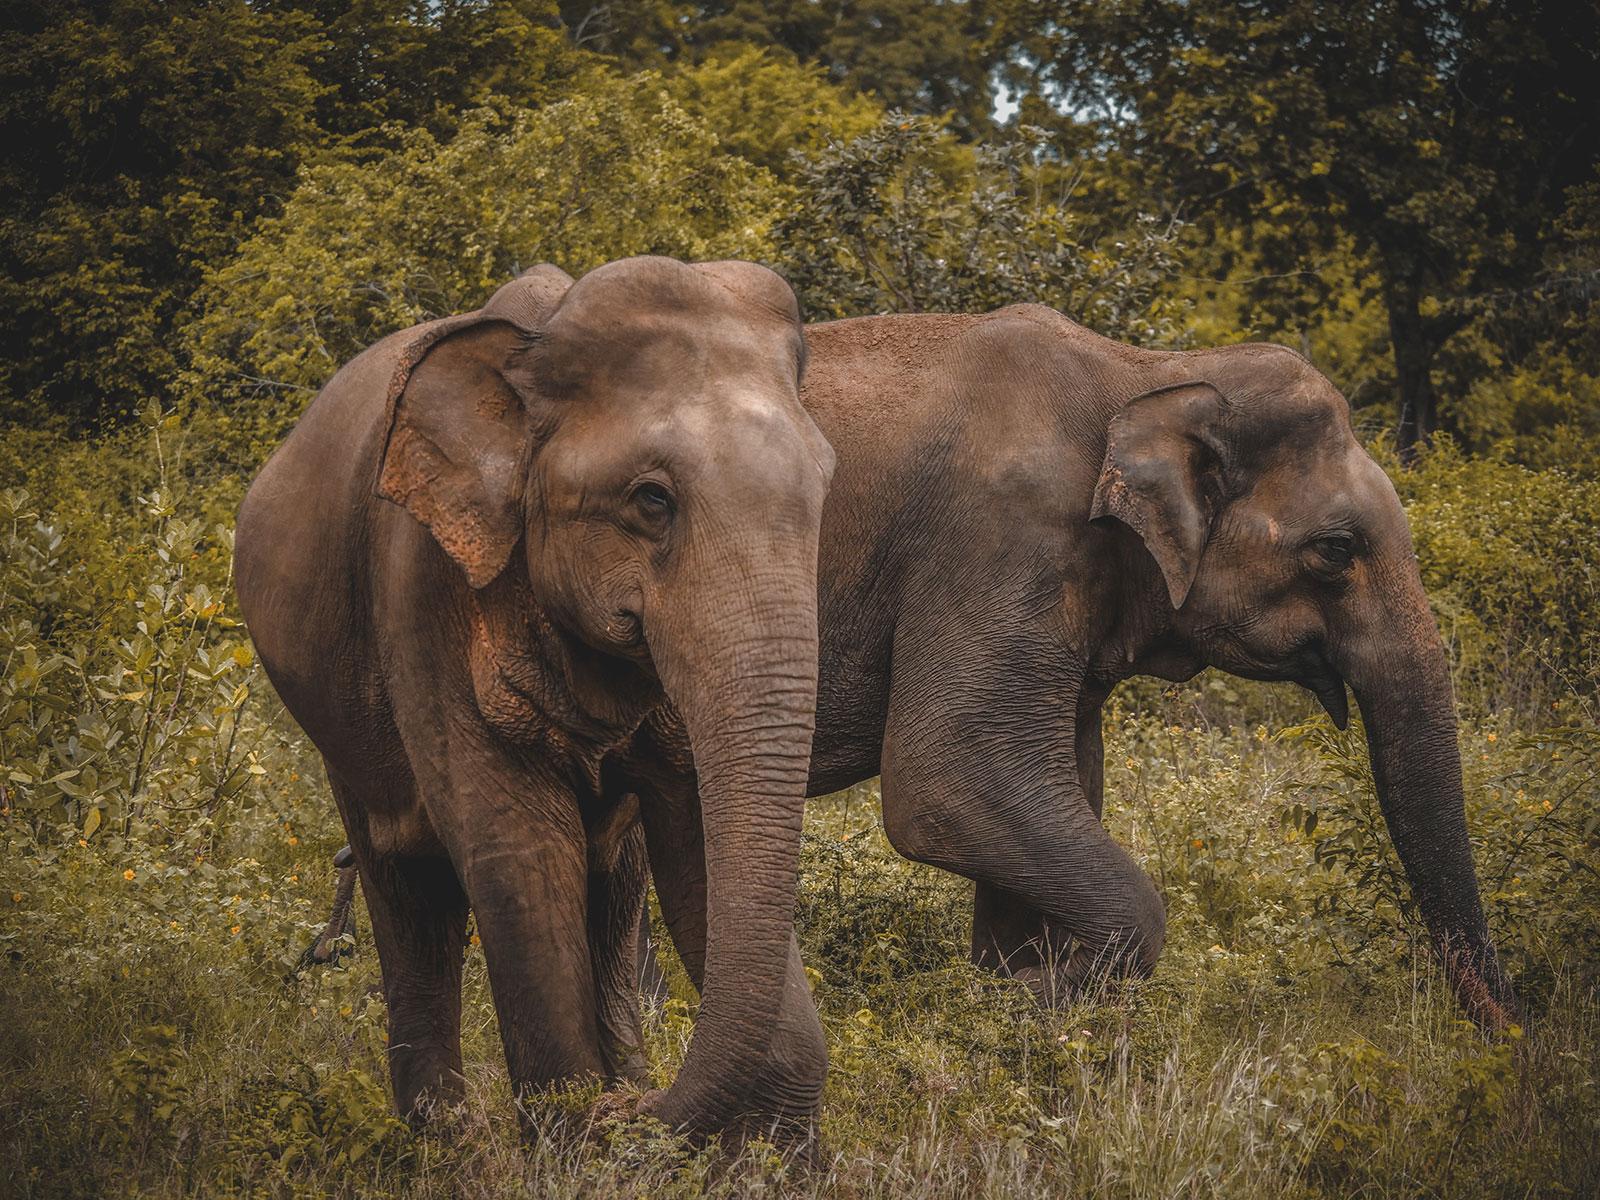 Elephants on safari in Udawalawe national park, Sri Lanka